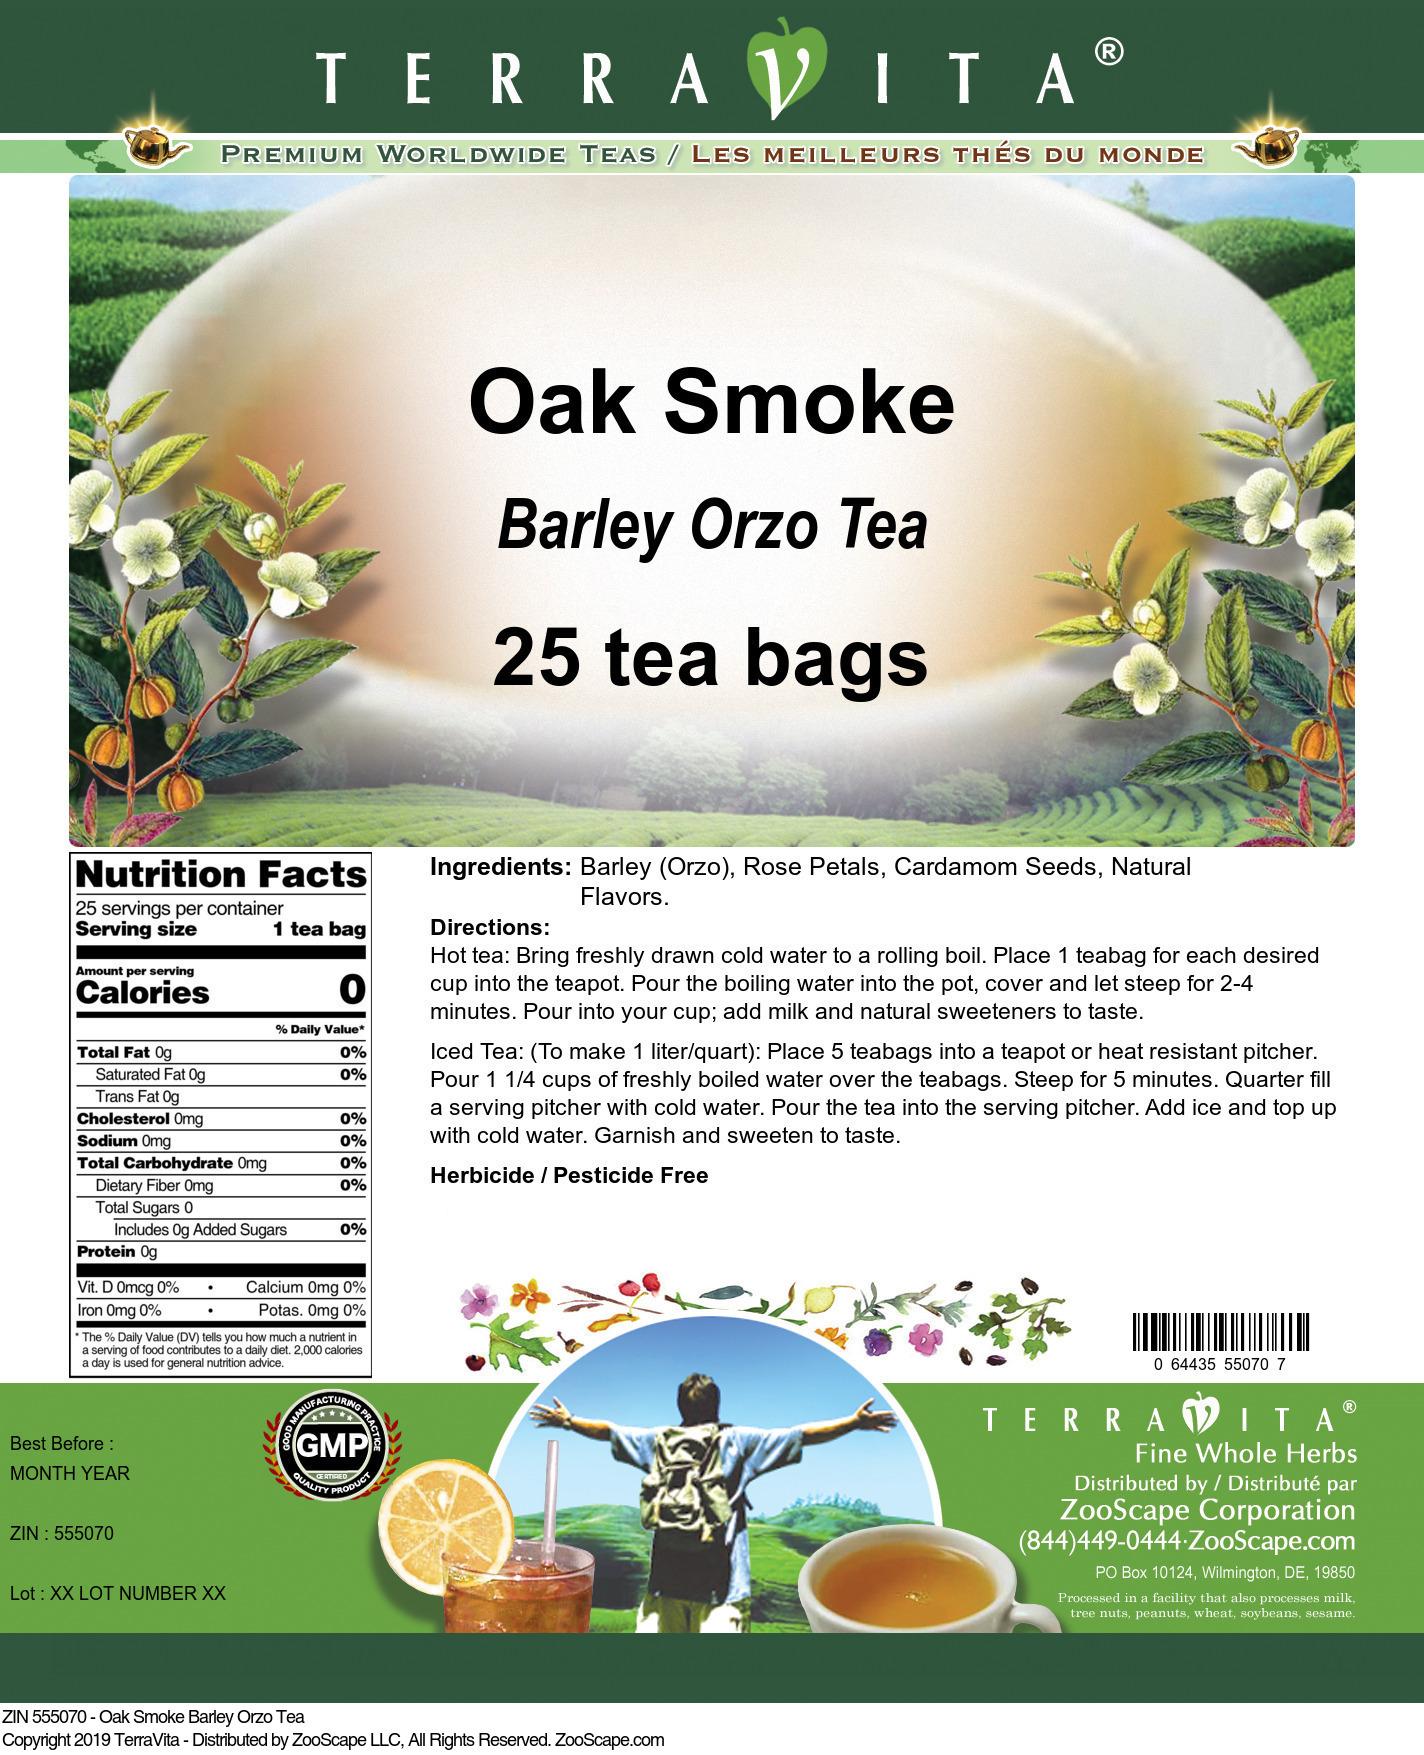 Oak Smoke Barley Orzo